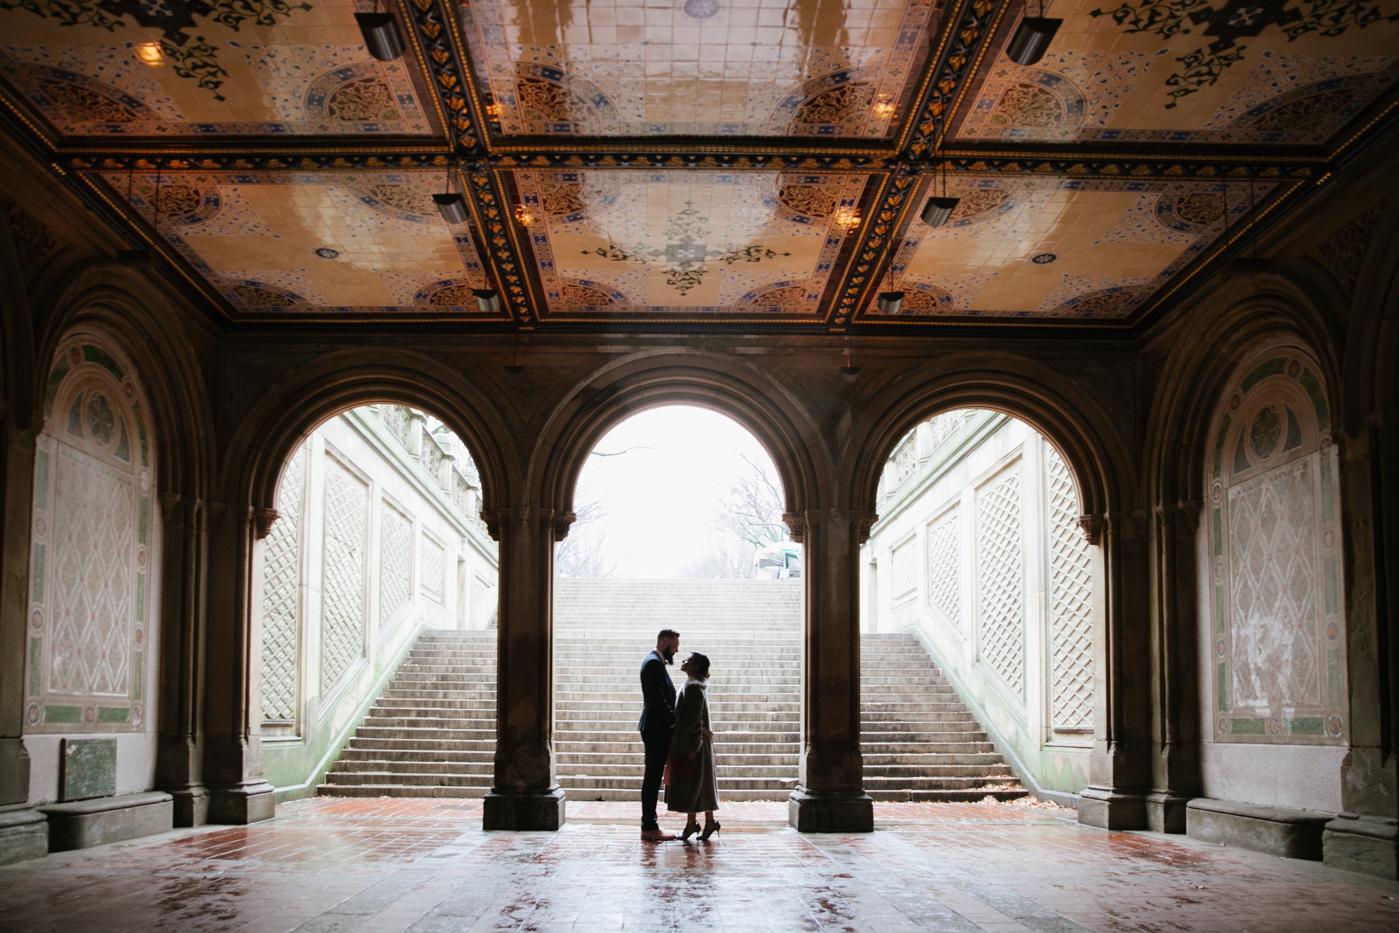 Central-park-wedding-by-Tanya-Isaeva-80.jpg